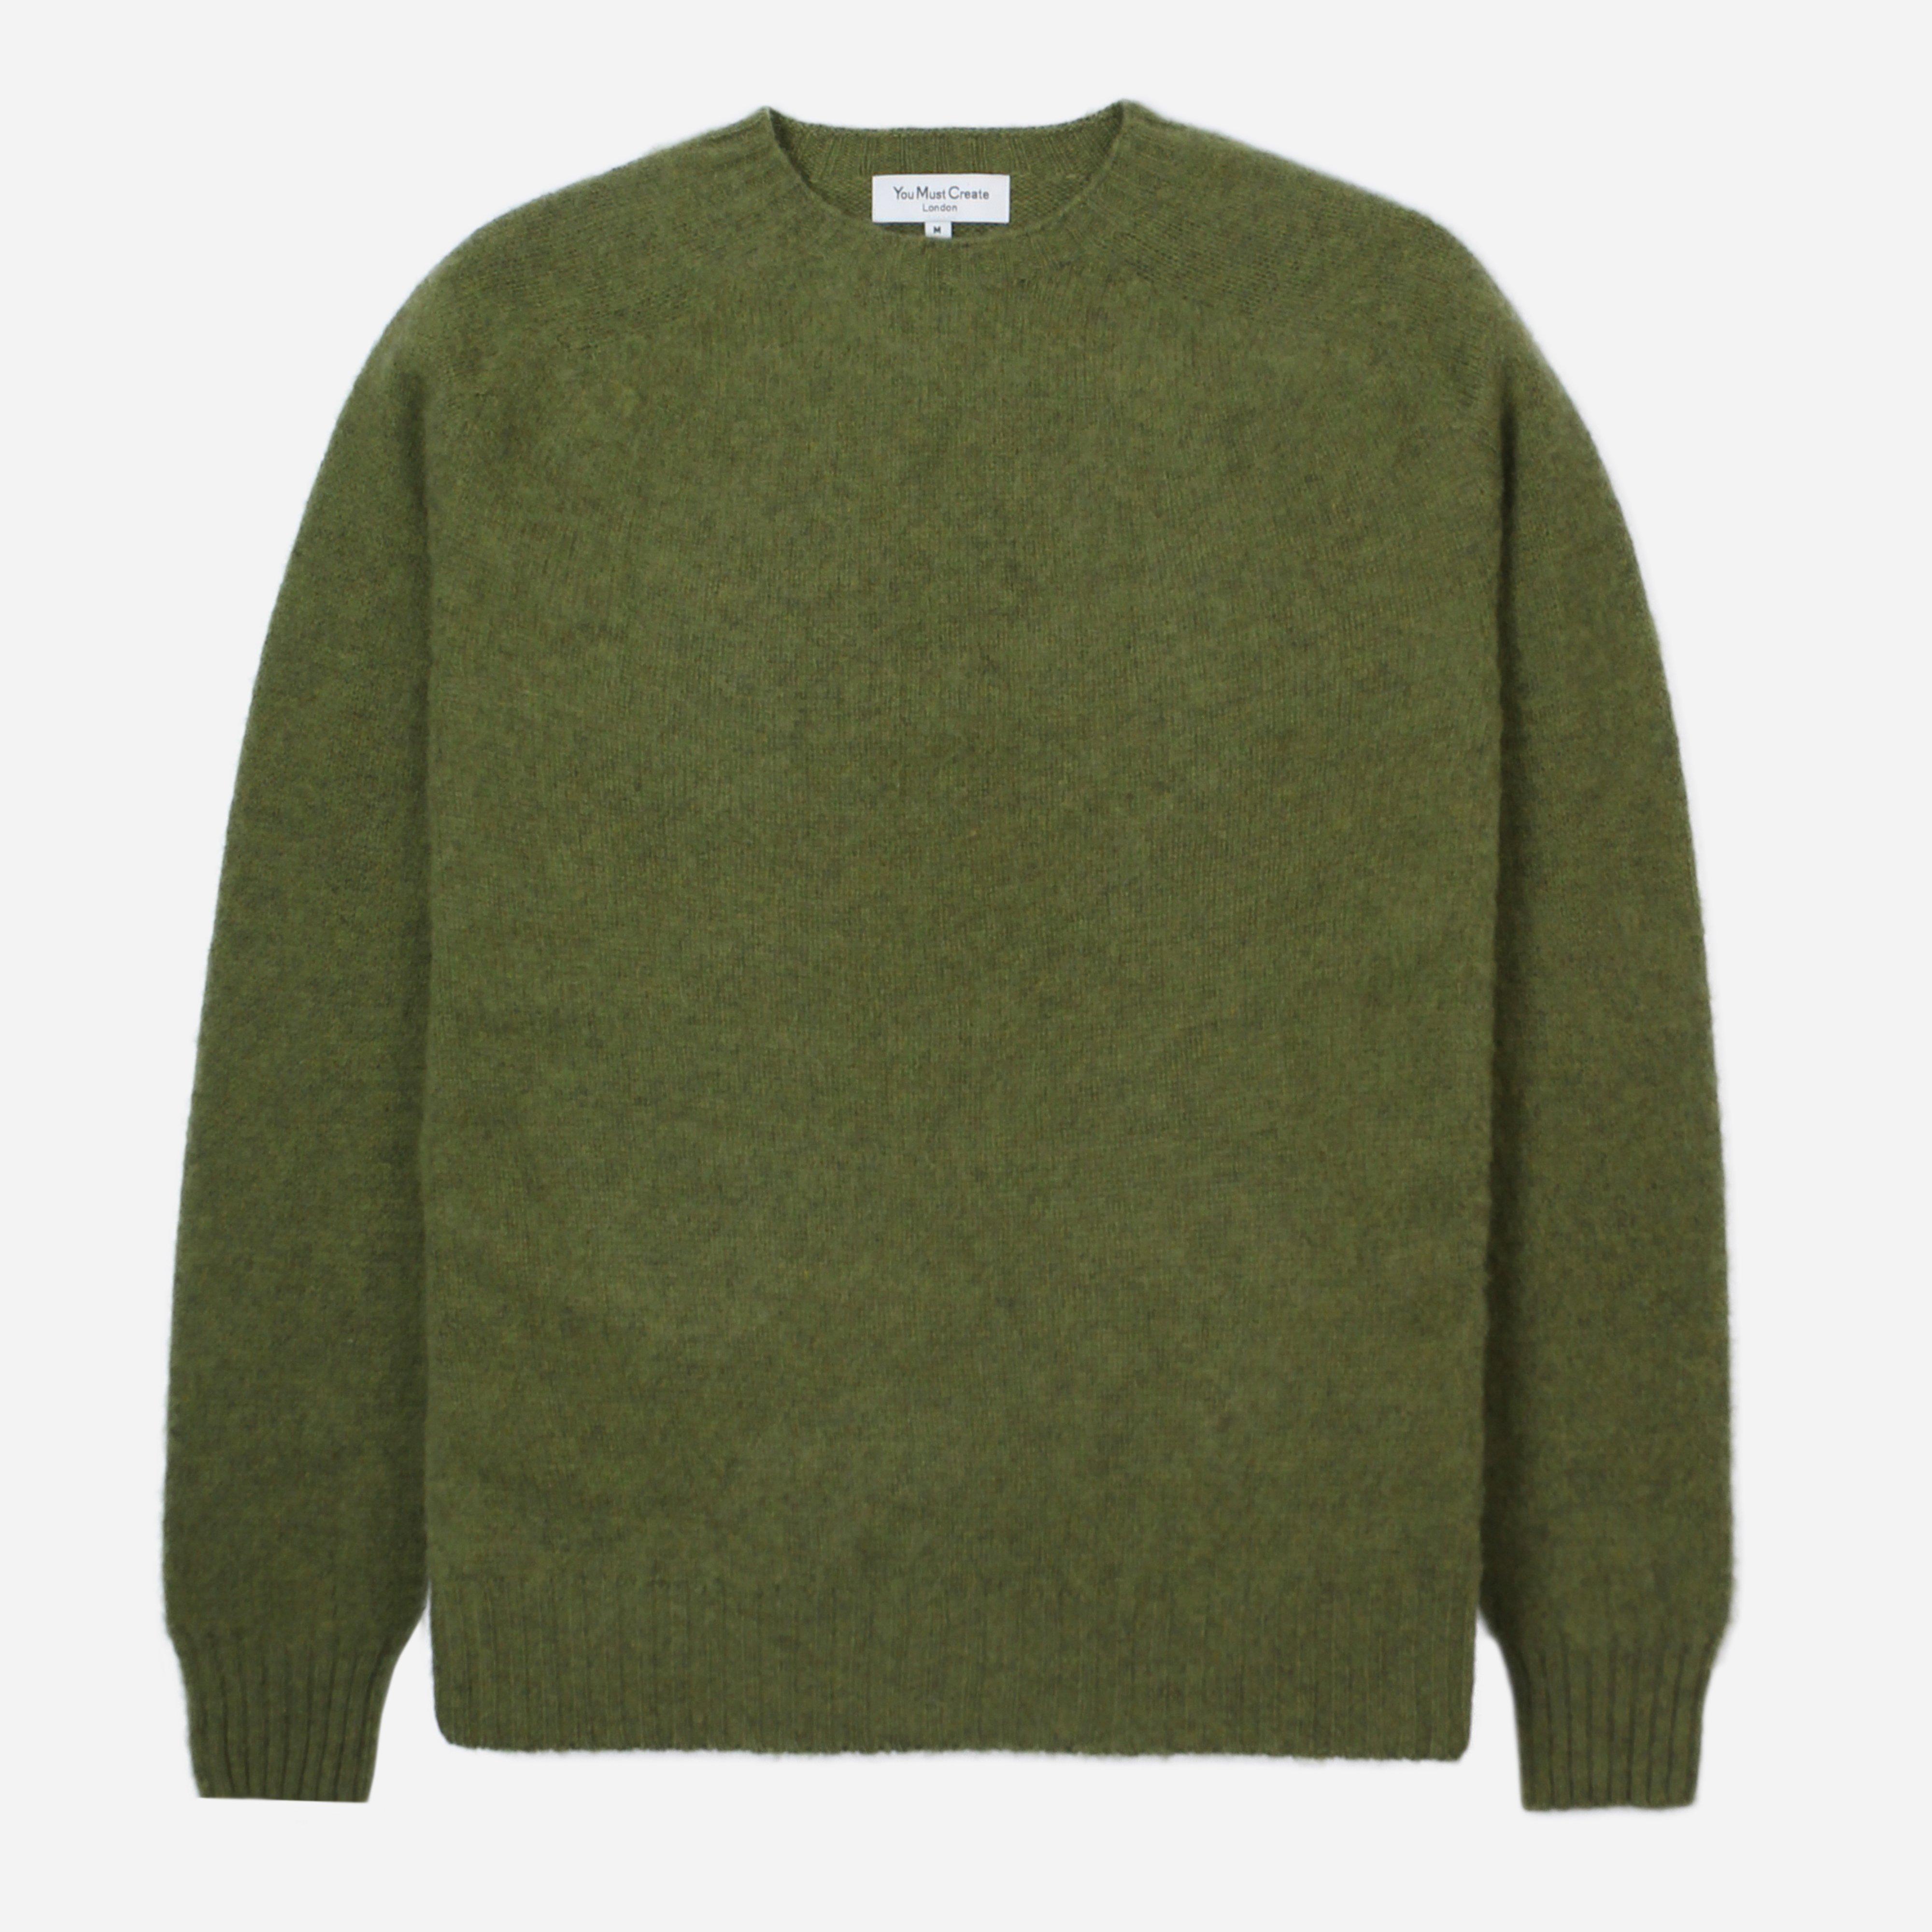 4f046be7876df3 Ymc Suedehead Crew Knit in Green for Men - Lyst